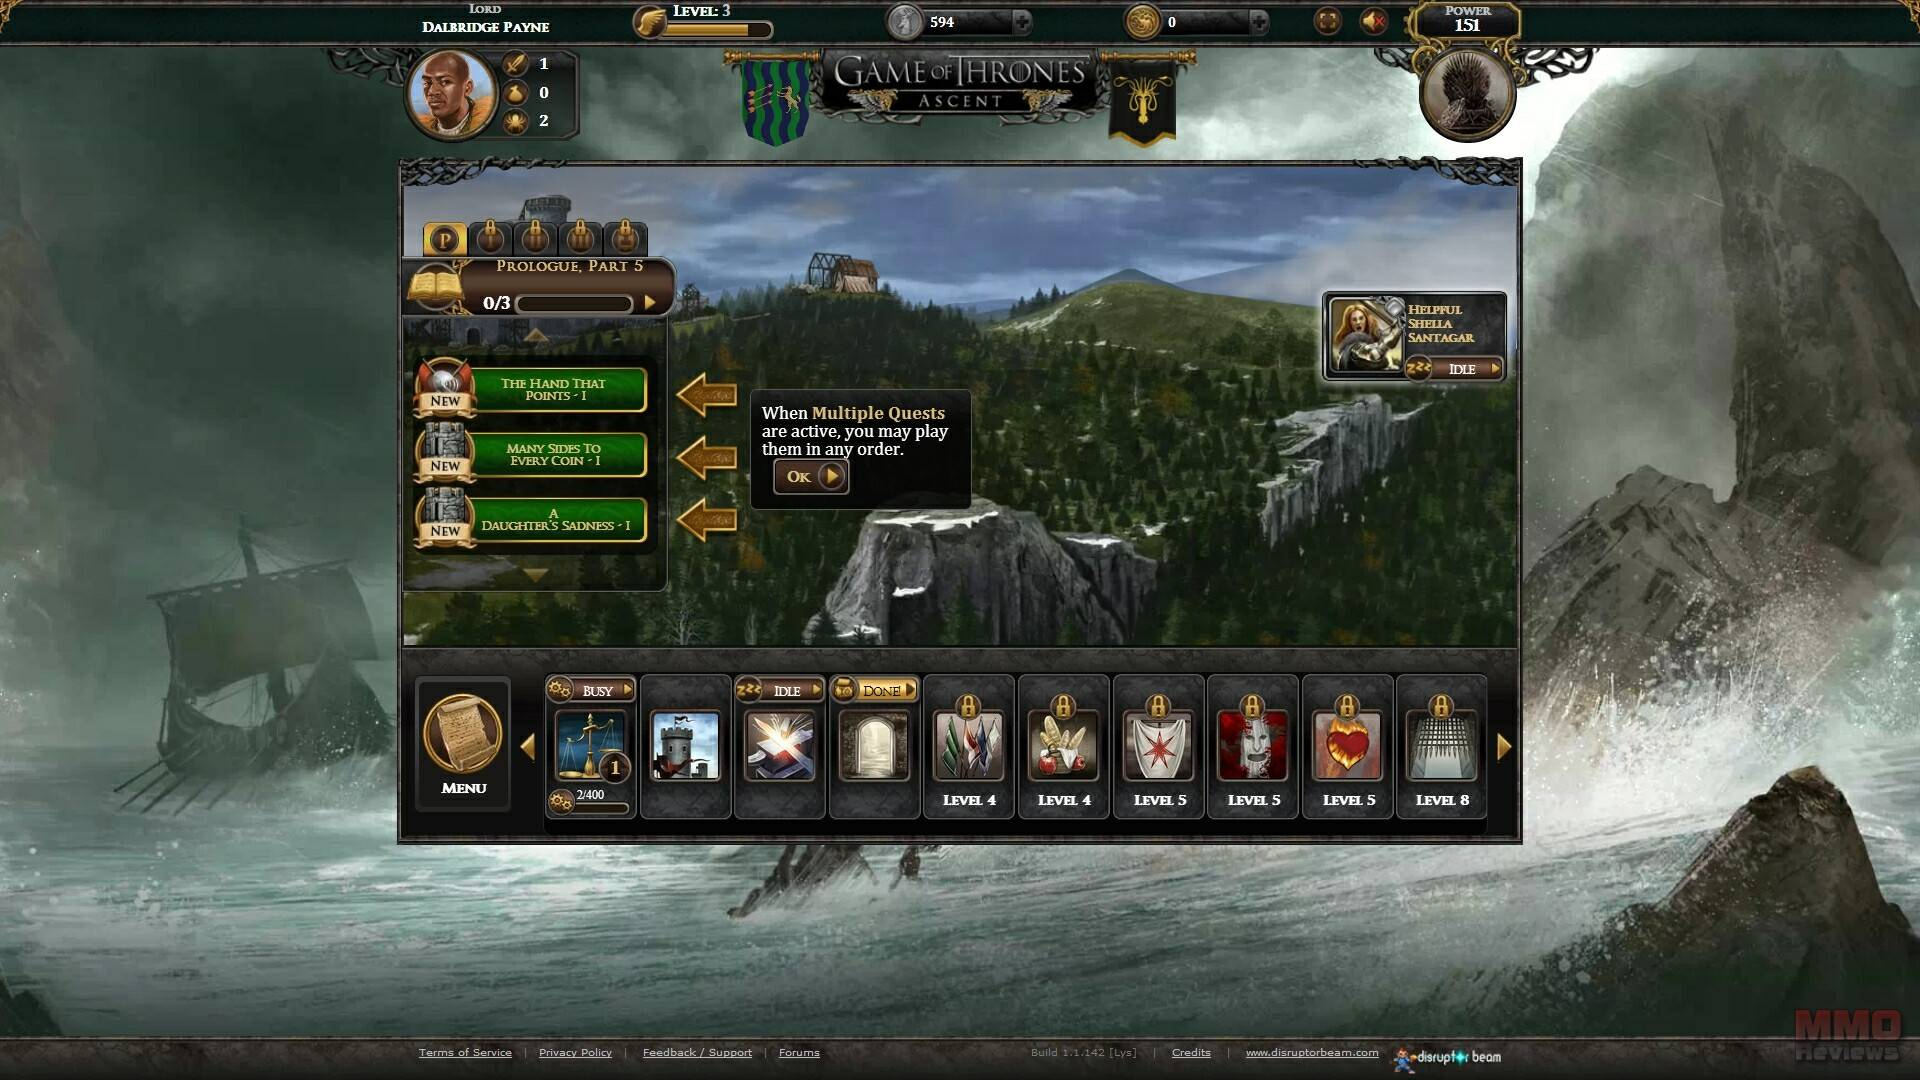 Imagenes de Game of Thrones: Ascent